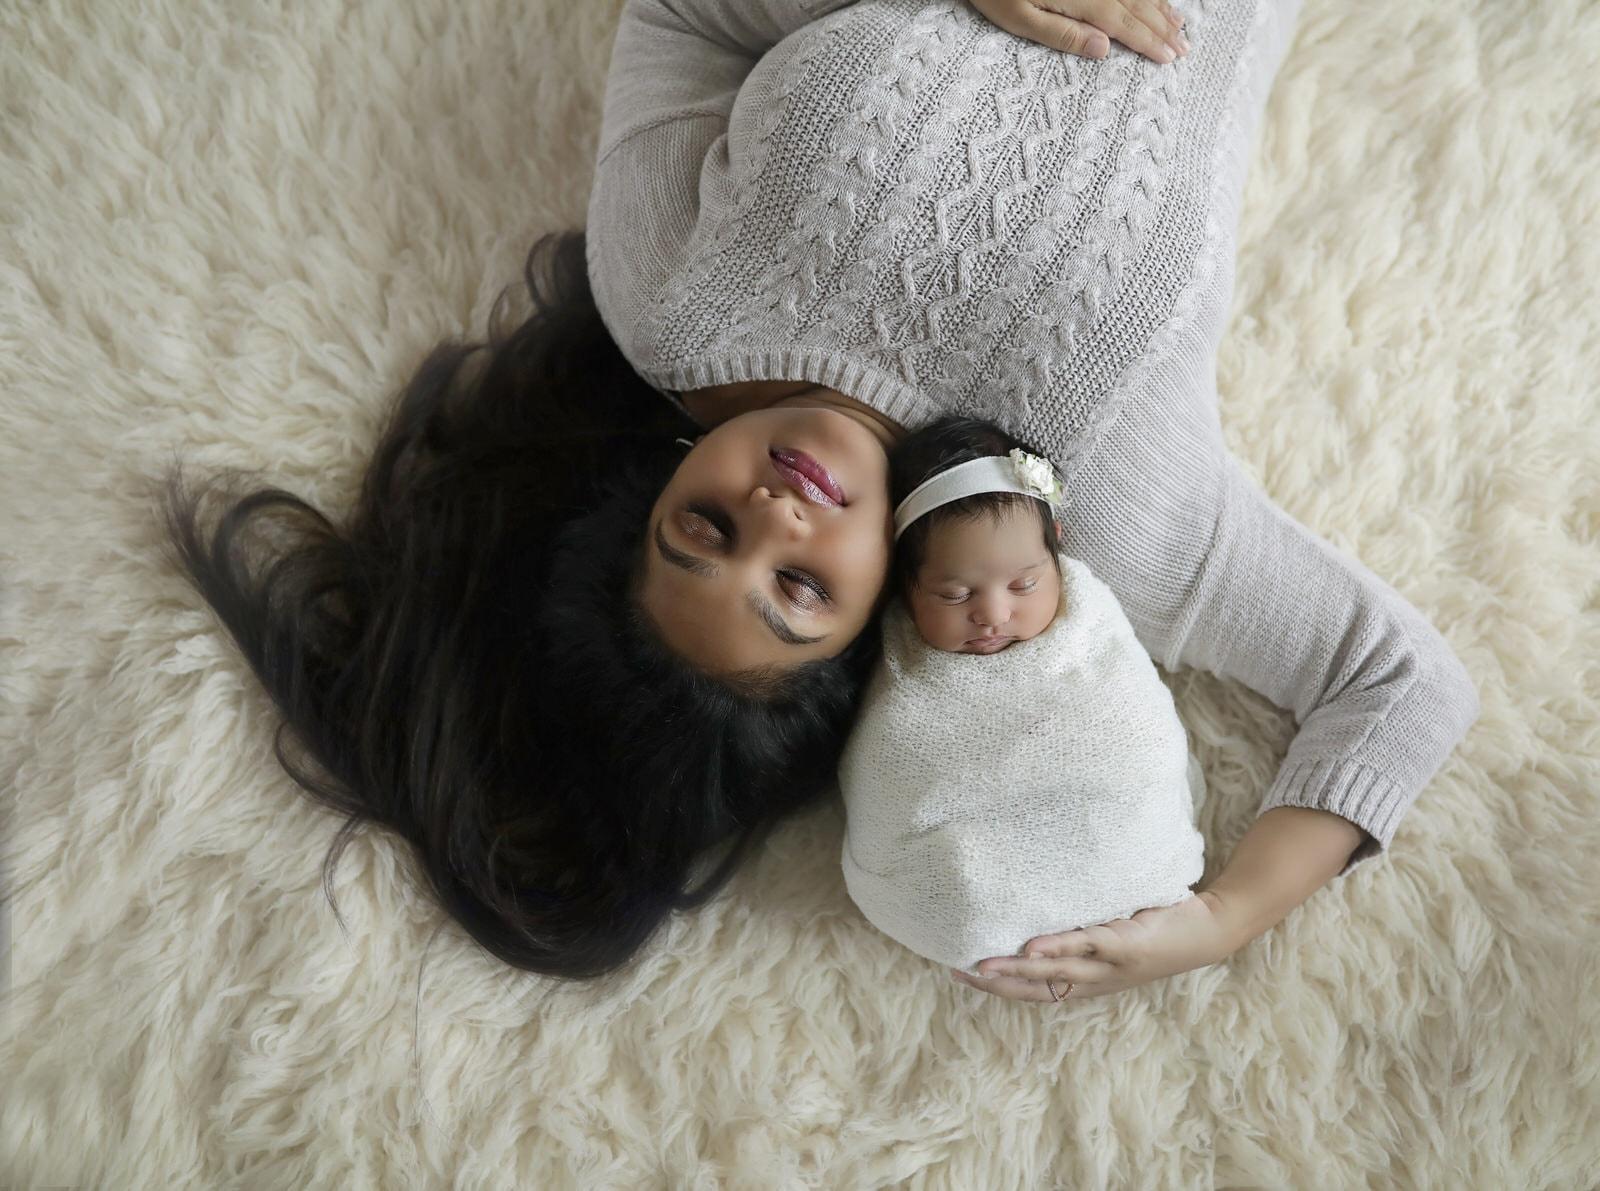 harrisburg newborn photographer captures mom with newborn daughter on white background